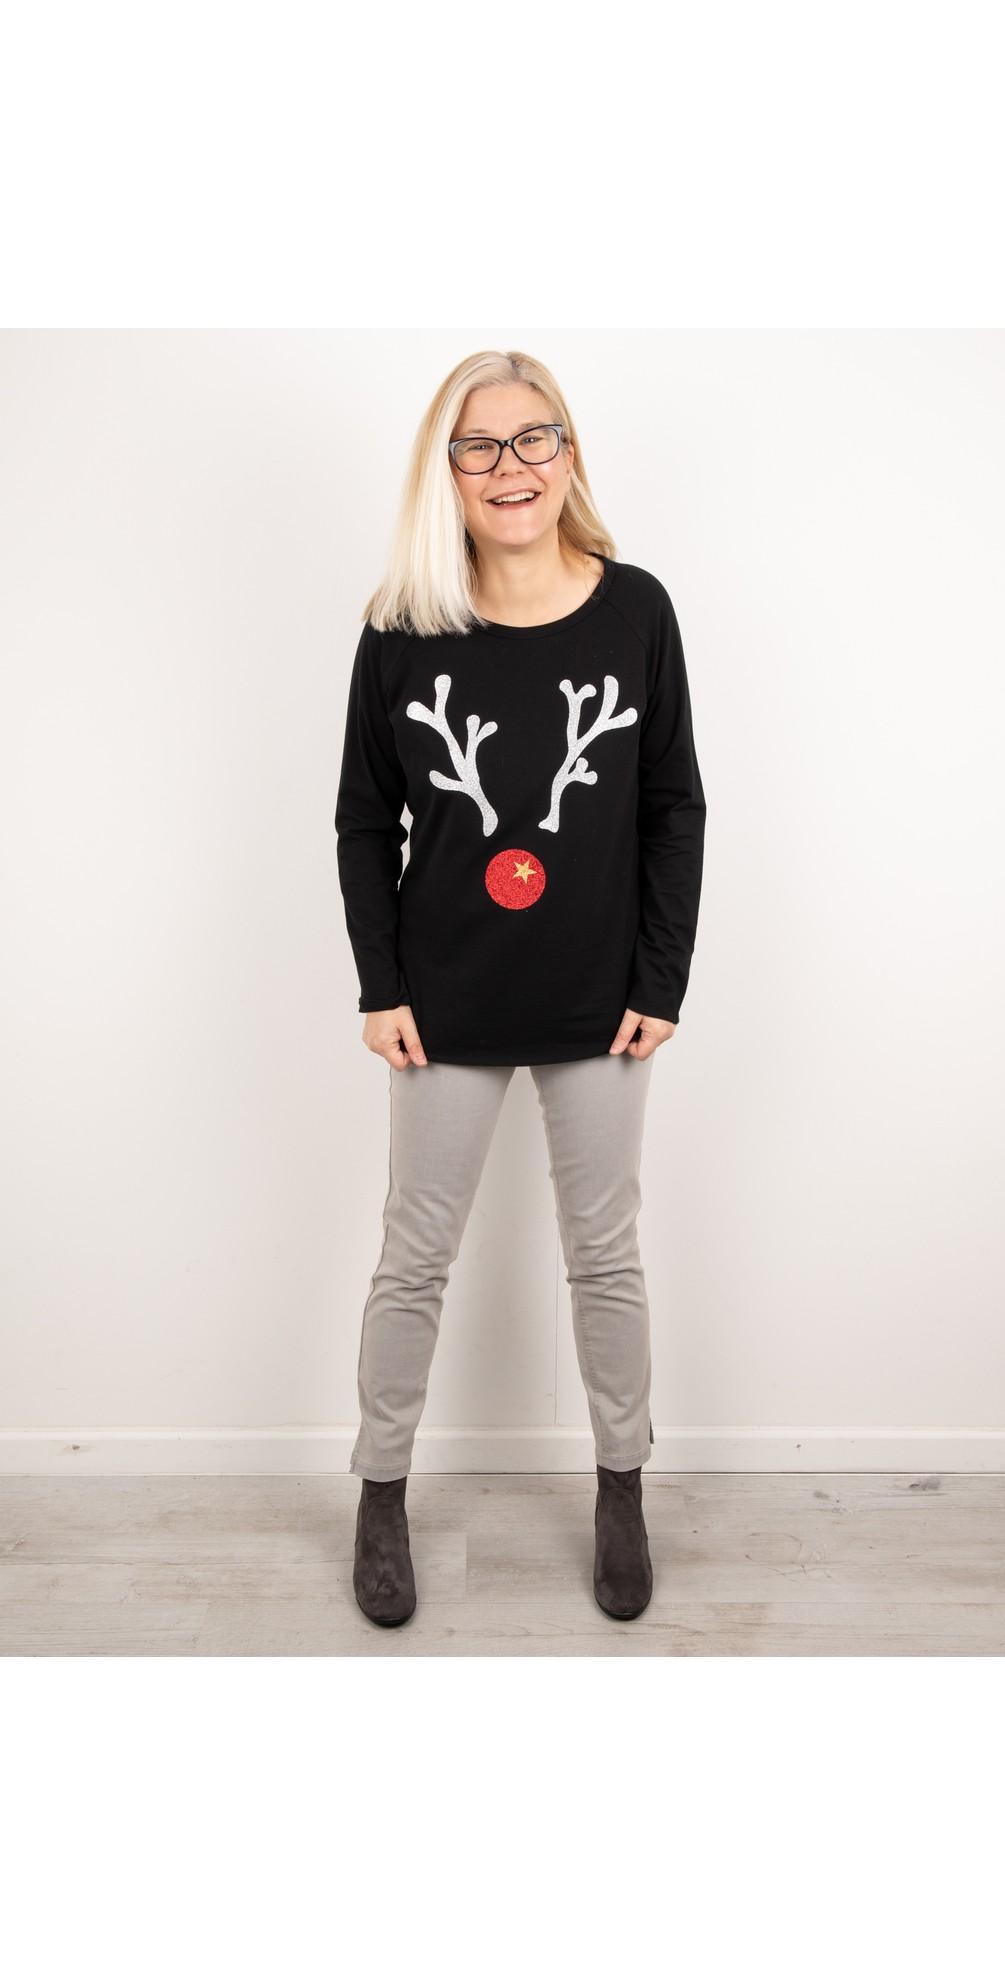 Tasha Giant Reindeer Top main image